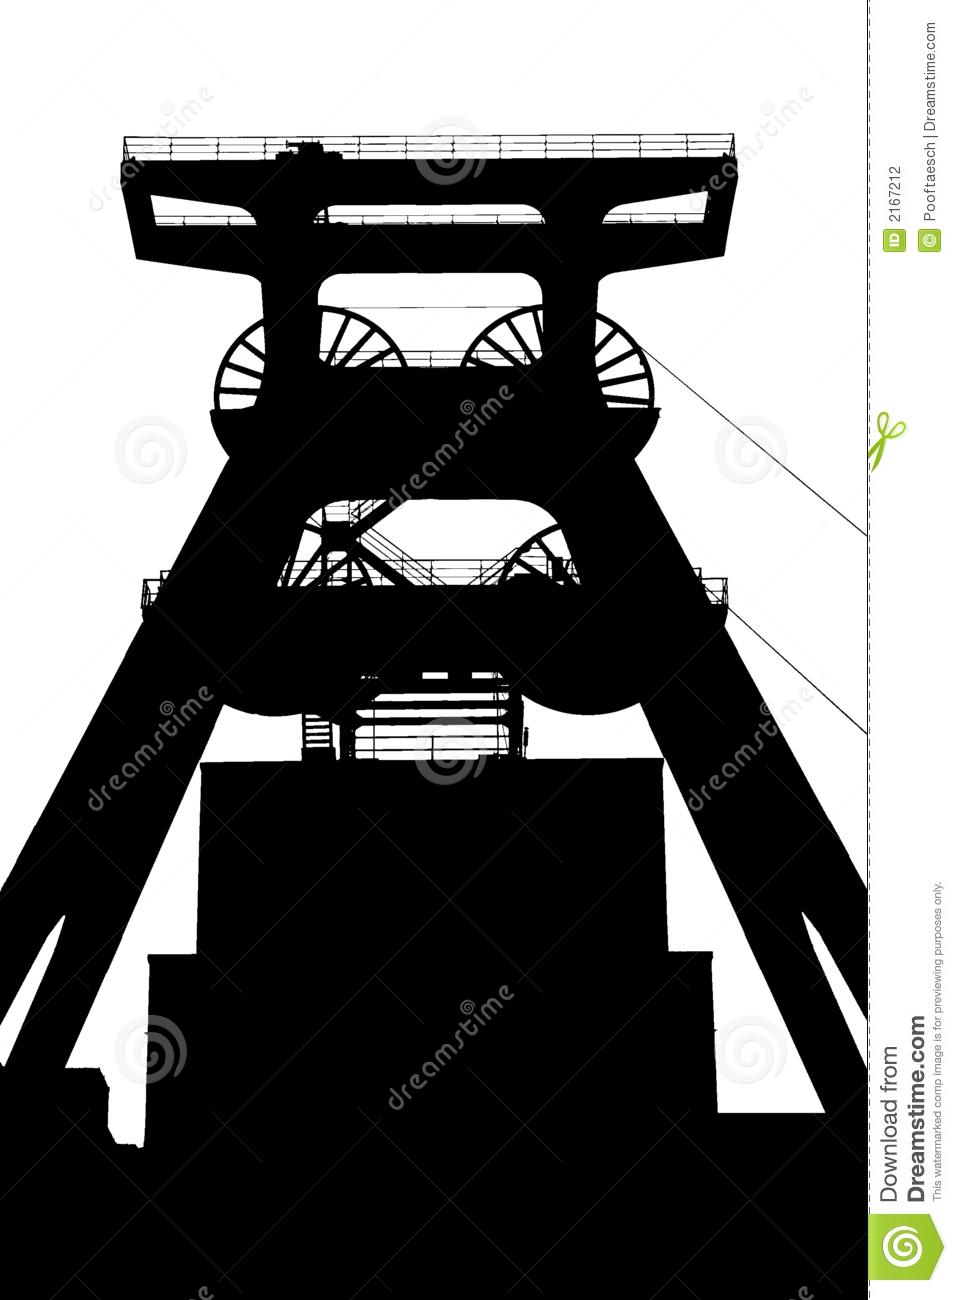 Zeche Zollverein Stock Photography.